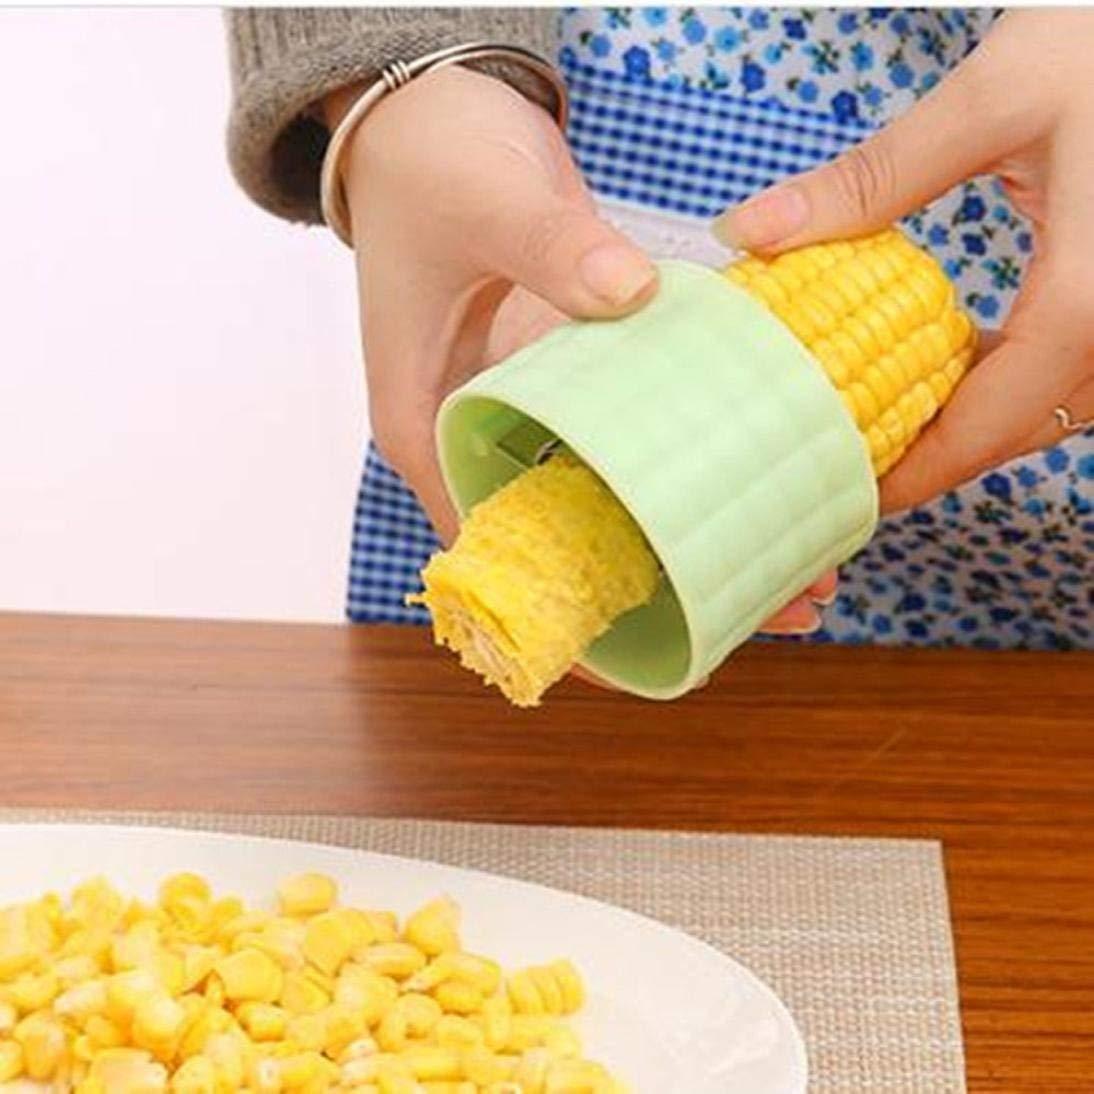 Sikye Corn Cob Cutter - One Step Easy Remove Corn Threshing Splitter Kitchen Tool Helper (Green)